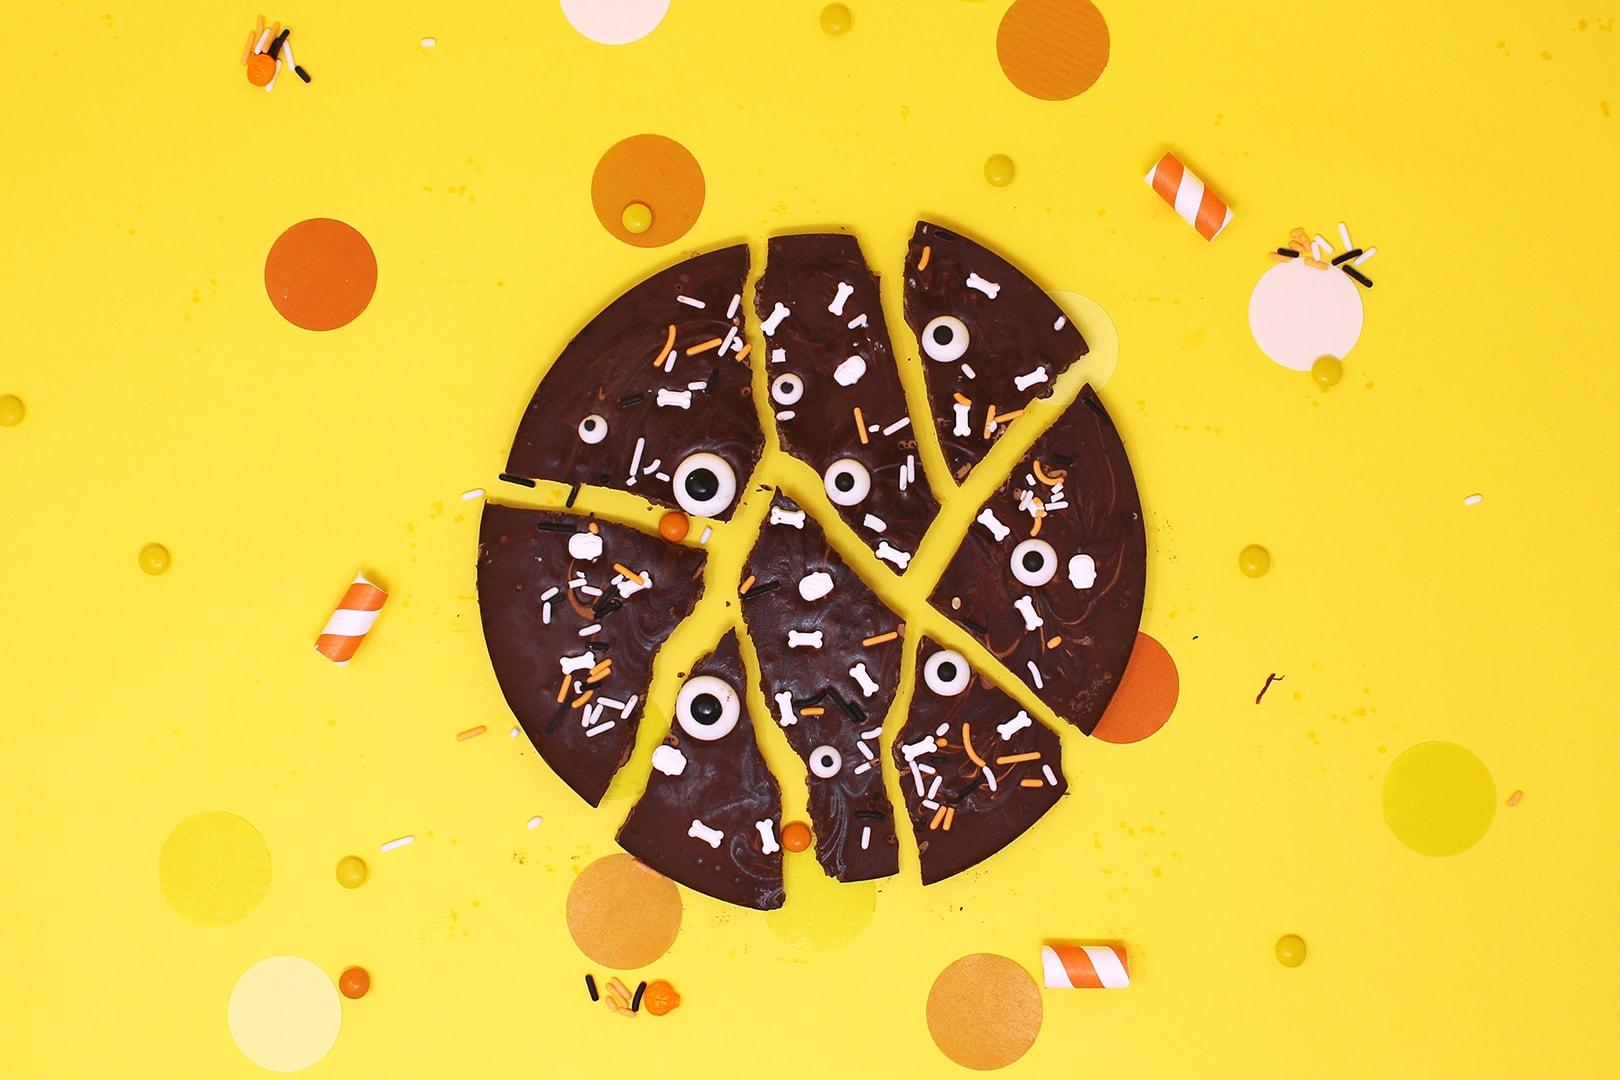 cioco-mostro-halloween-super-colors-2-min